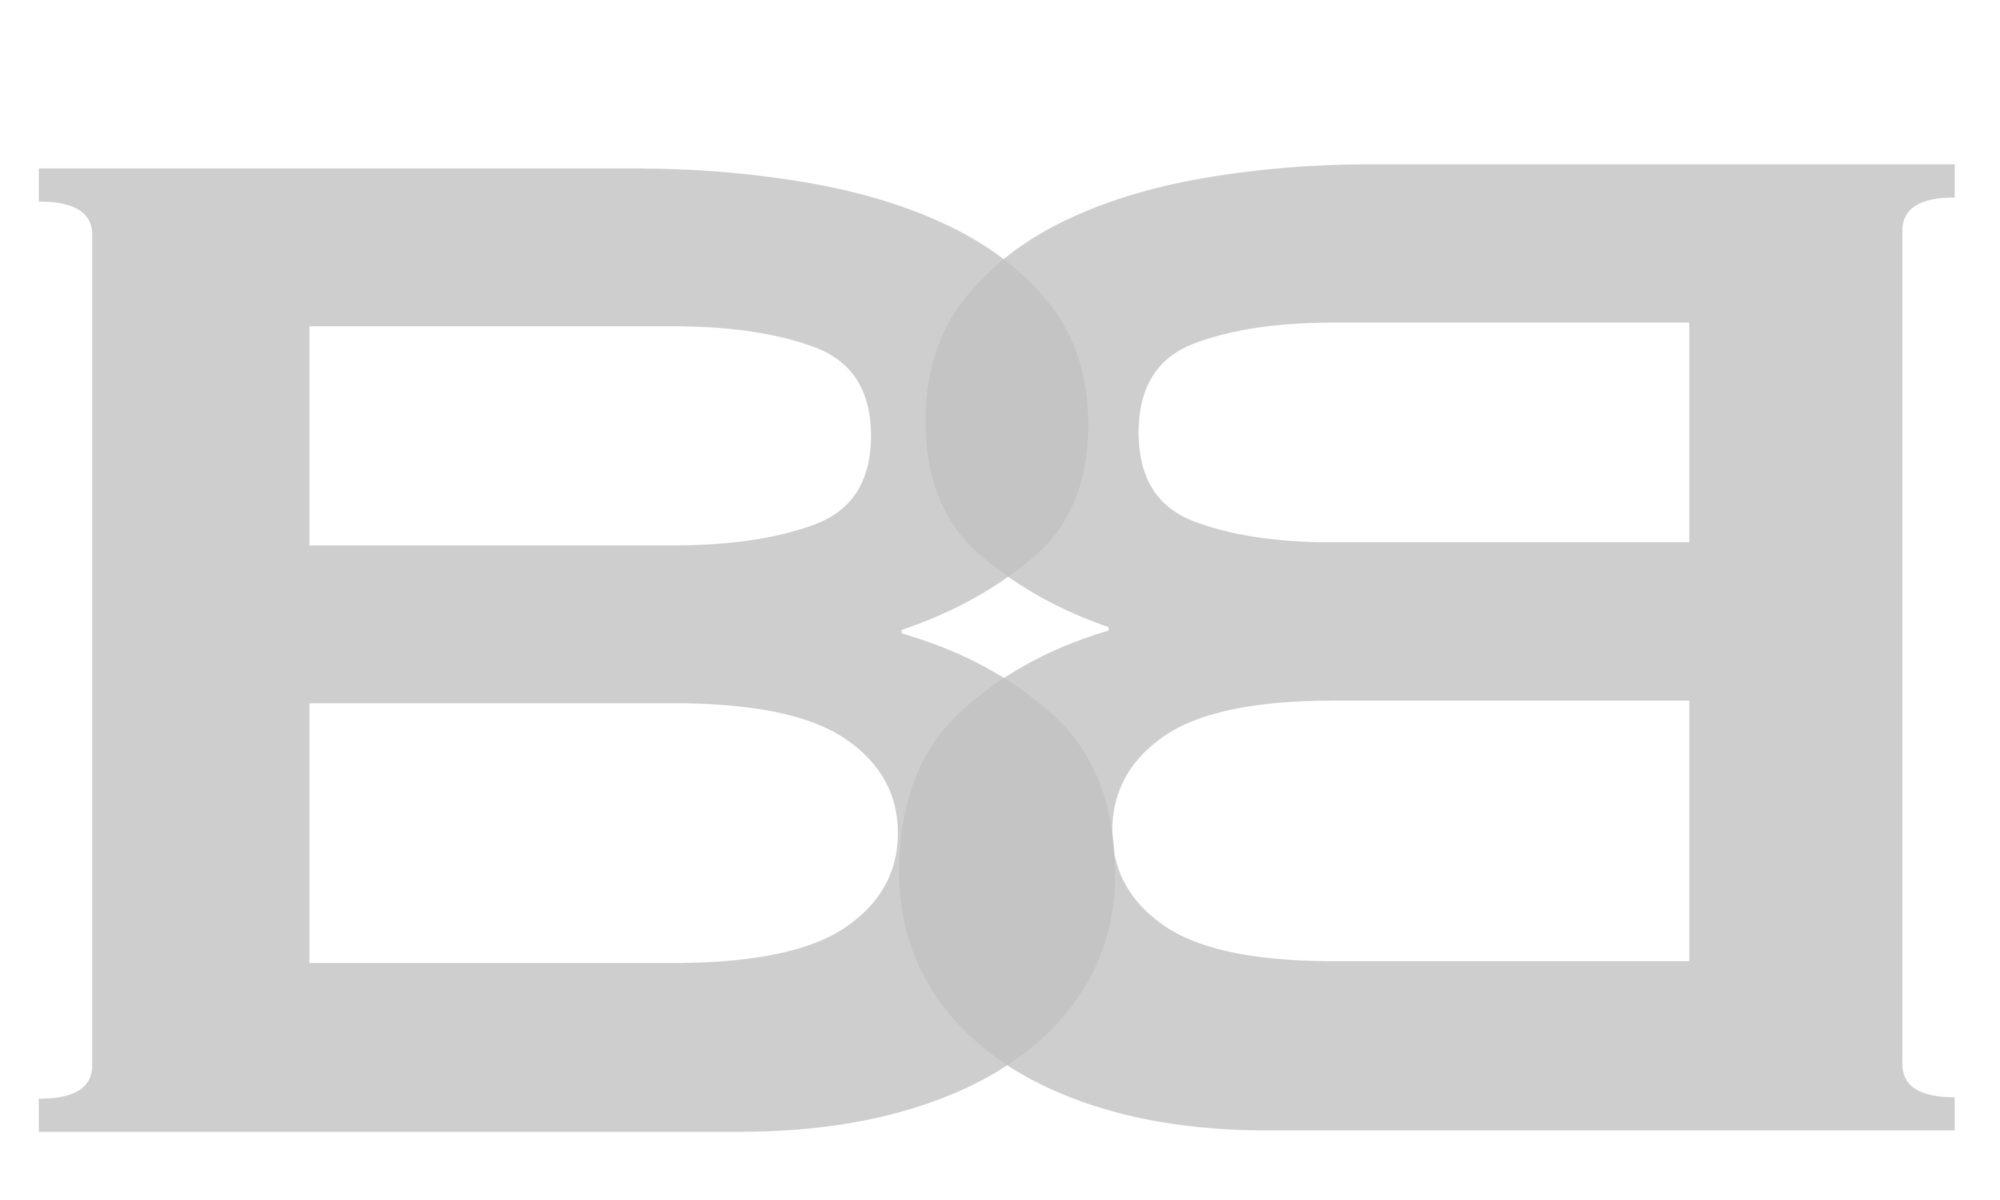 Agence éditoriale pluridisciplinaire